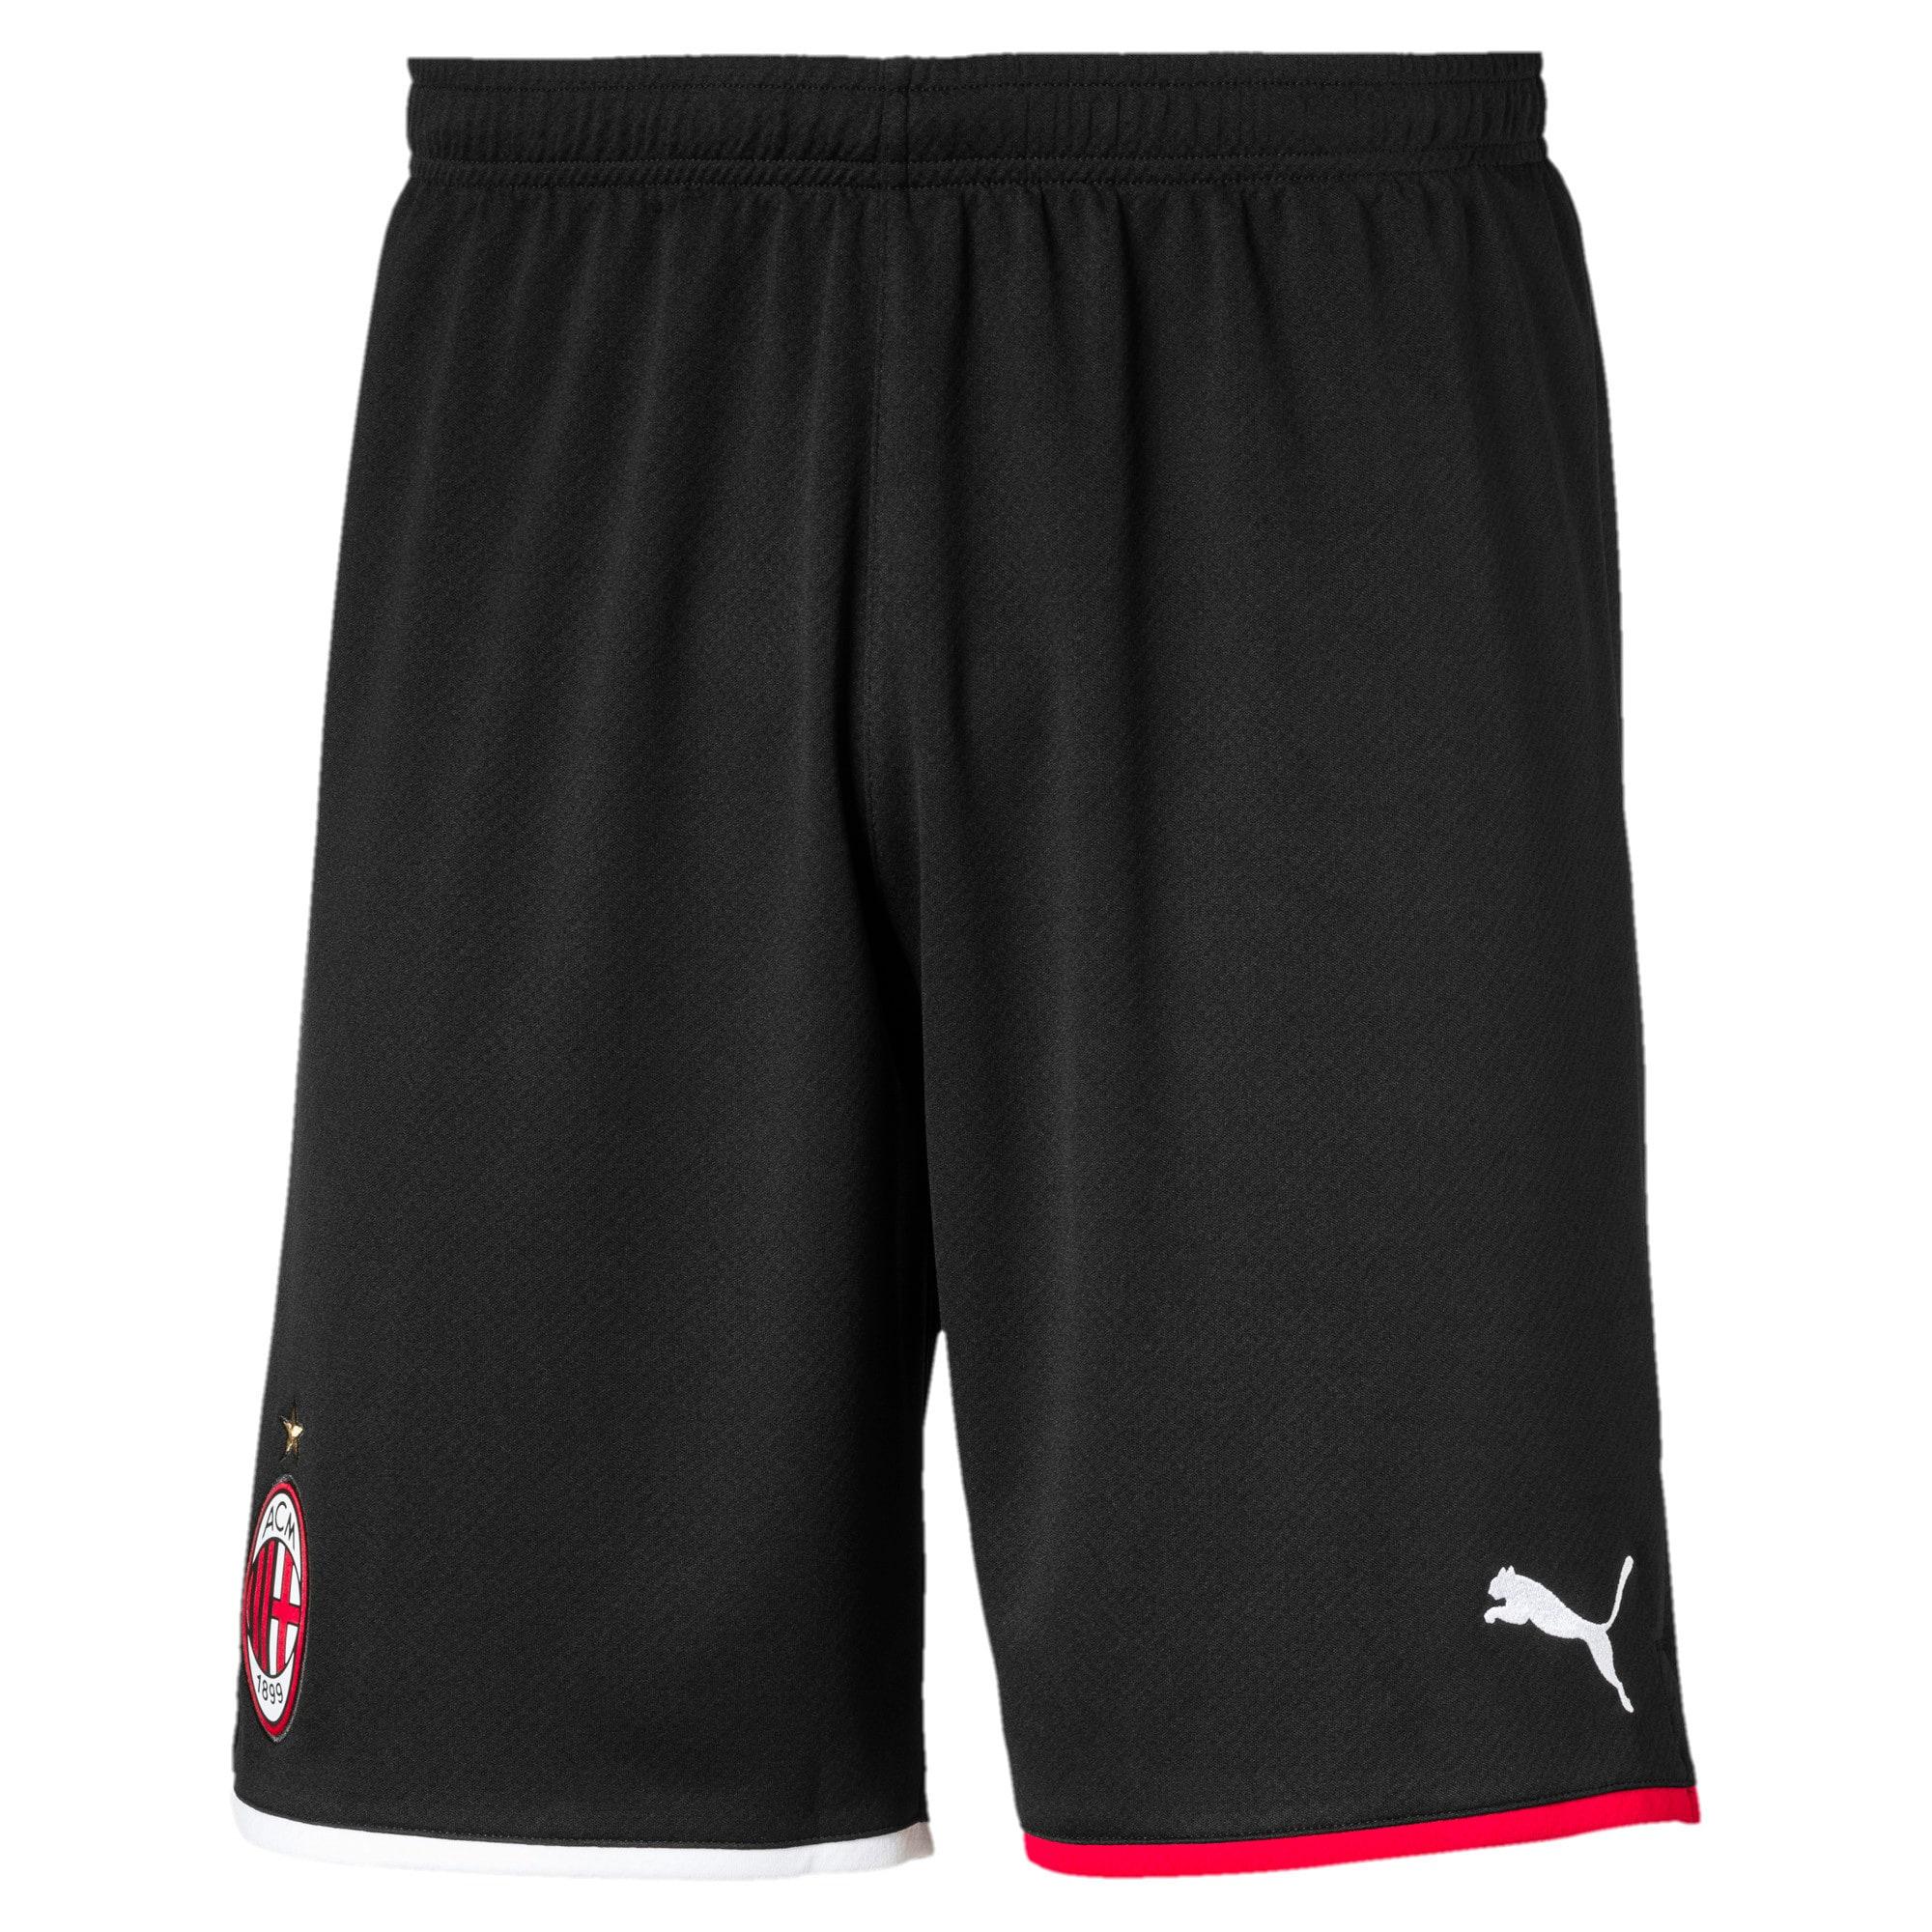 Thumbnail 1 of AC Milan Men's Away Replica Shorts, Puma Black-Tango Red, medium